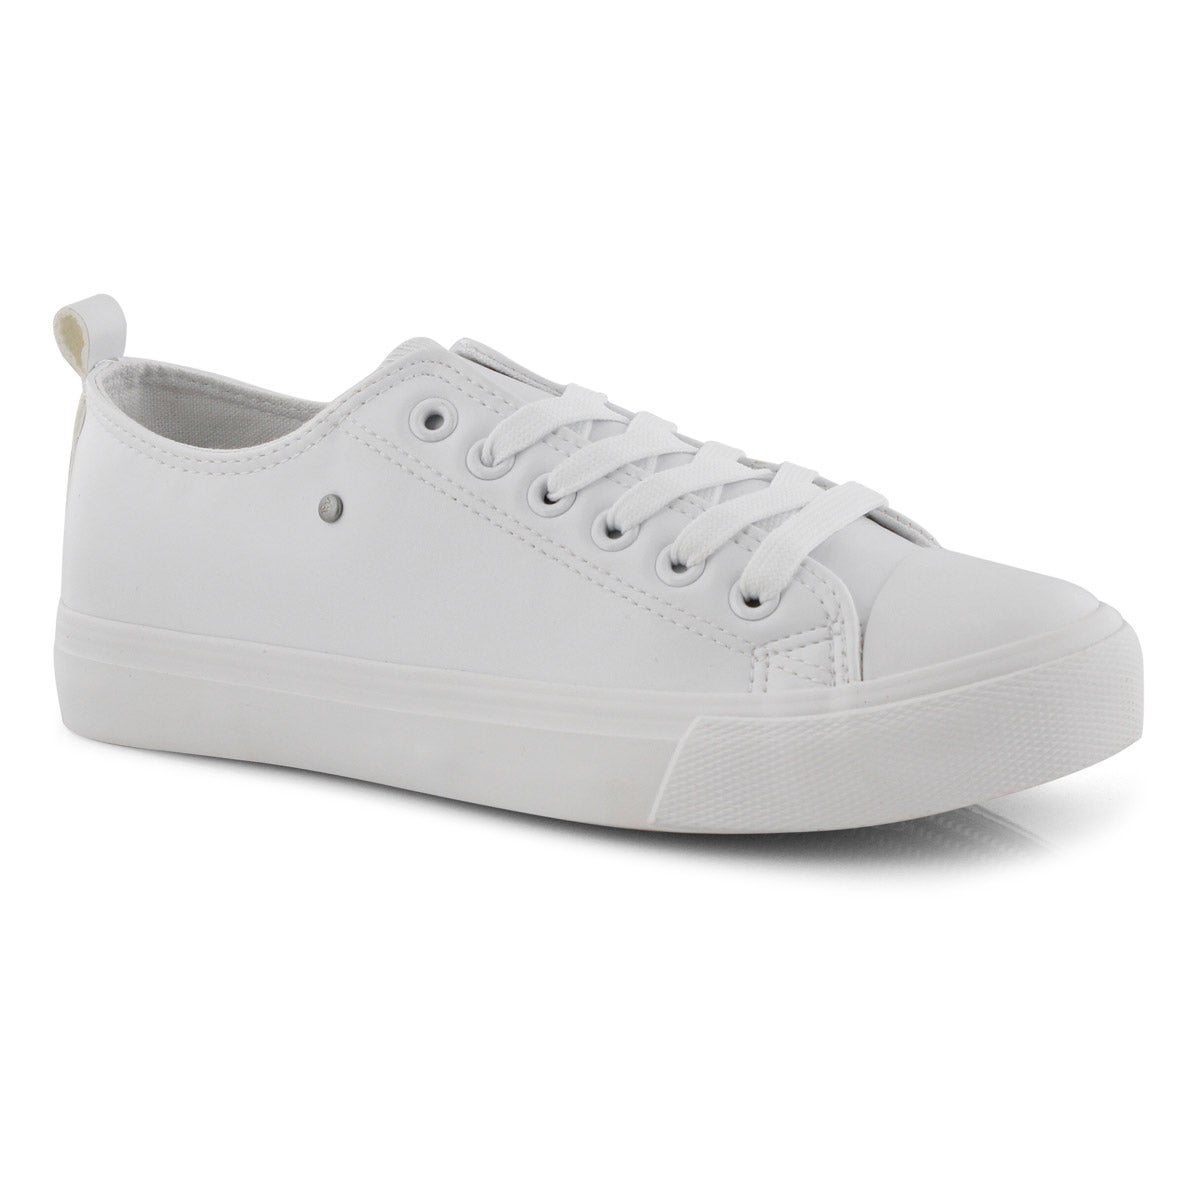 Lds Hazel white vegan lace up sneaker